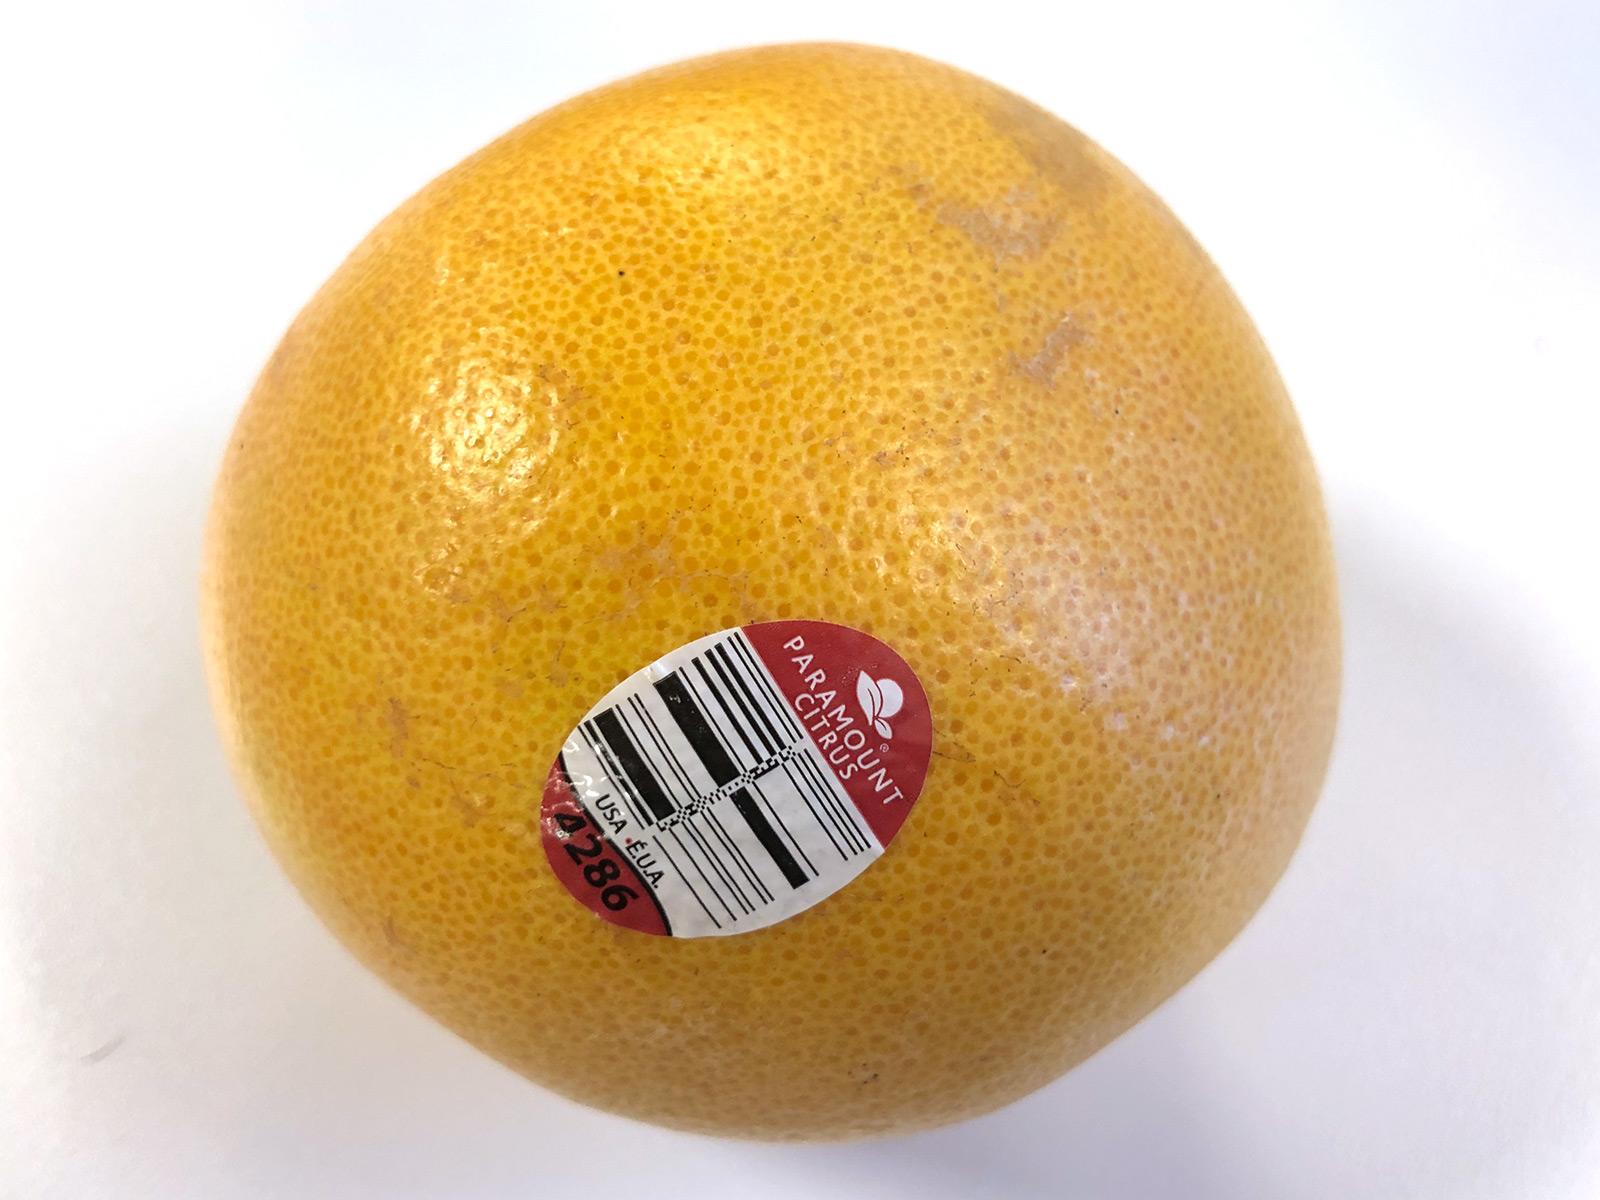 4286-USA-paramount-deep-red-grapefruit-.jpg